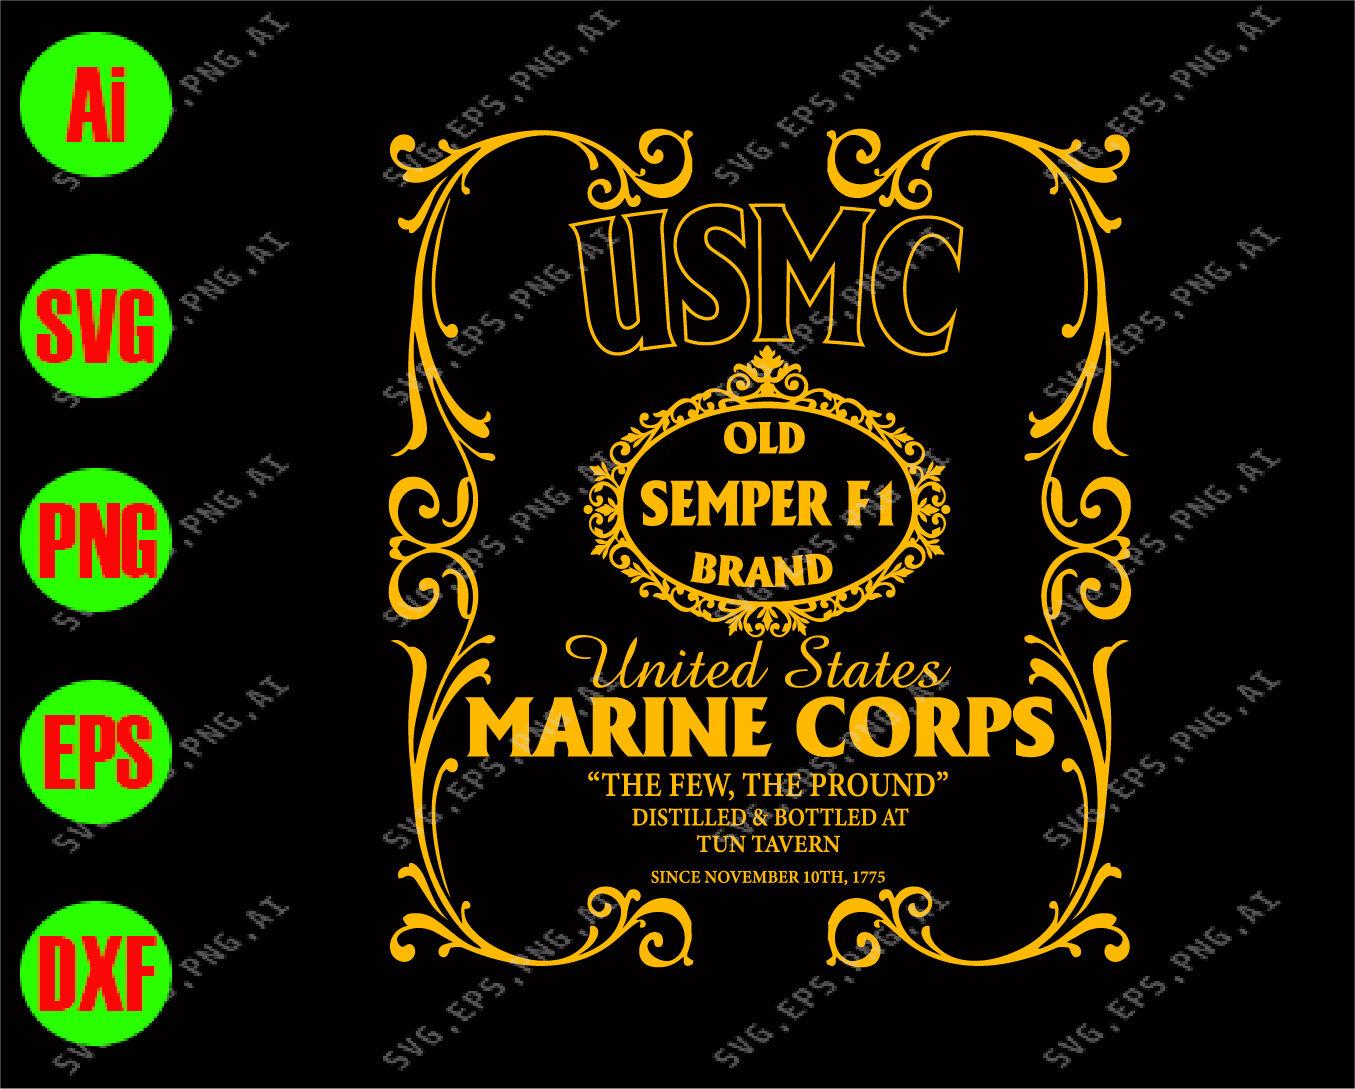 USMC old SEMPER FI brand United States marine corps svg.